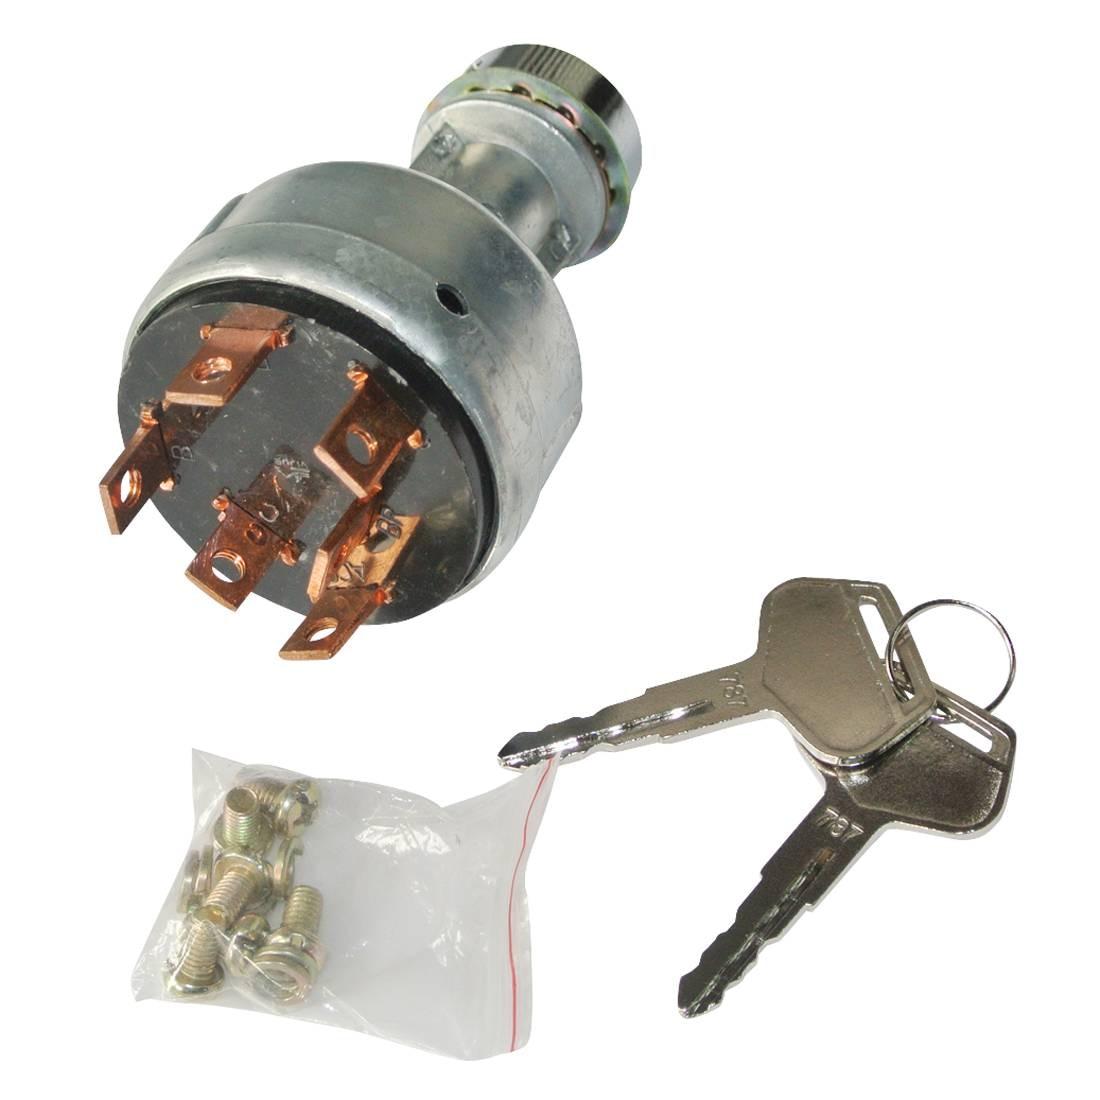 key switch wiring diagram komatsu key wiring diagrams Pollak Ignition Switch Wiring Diagram indak ignition switch wiring diagram